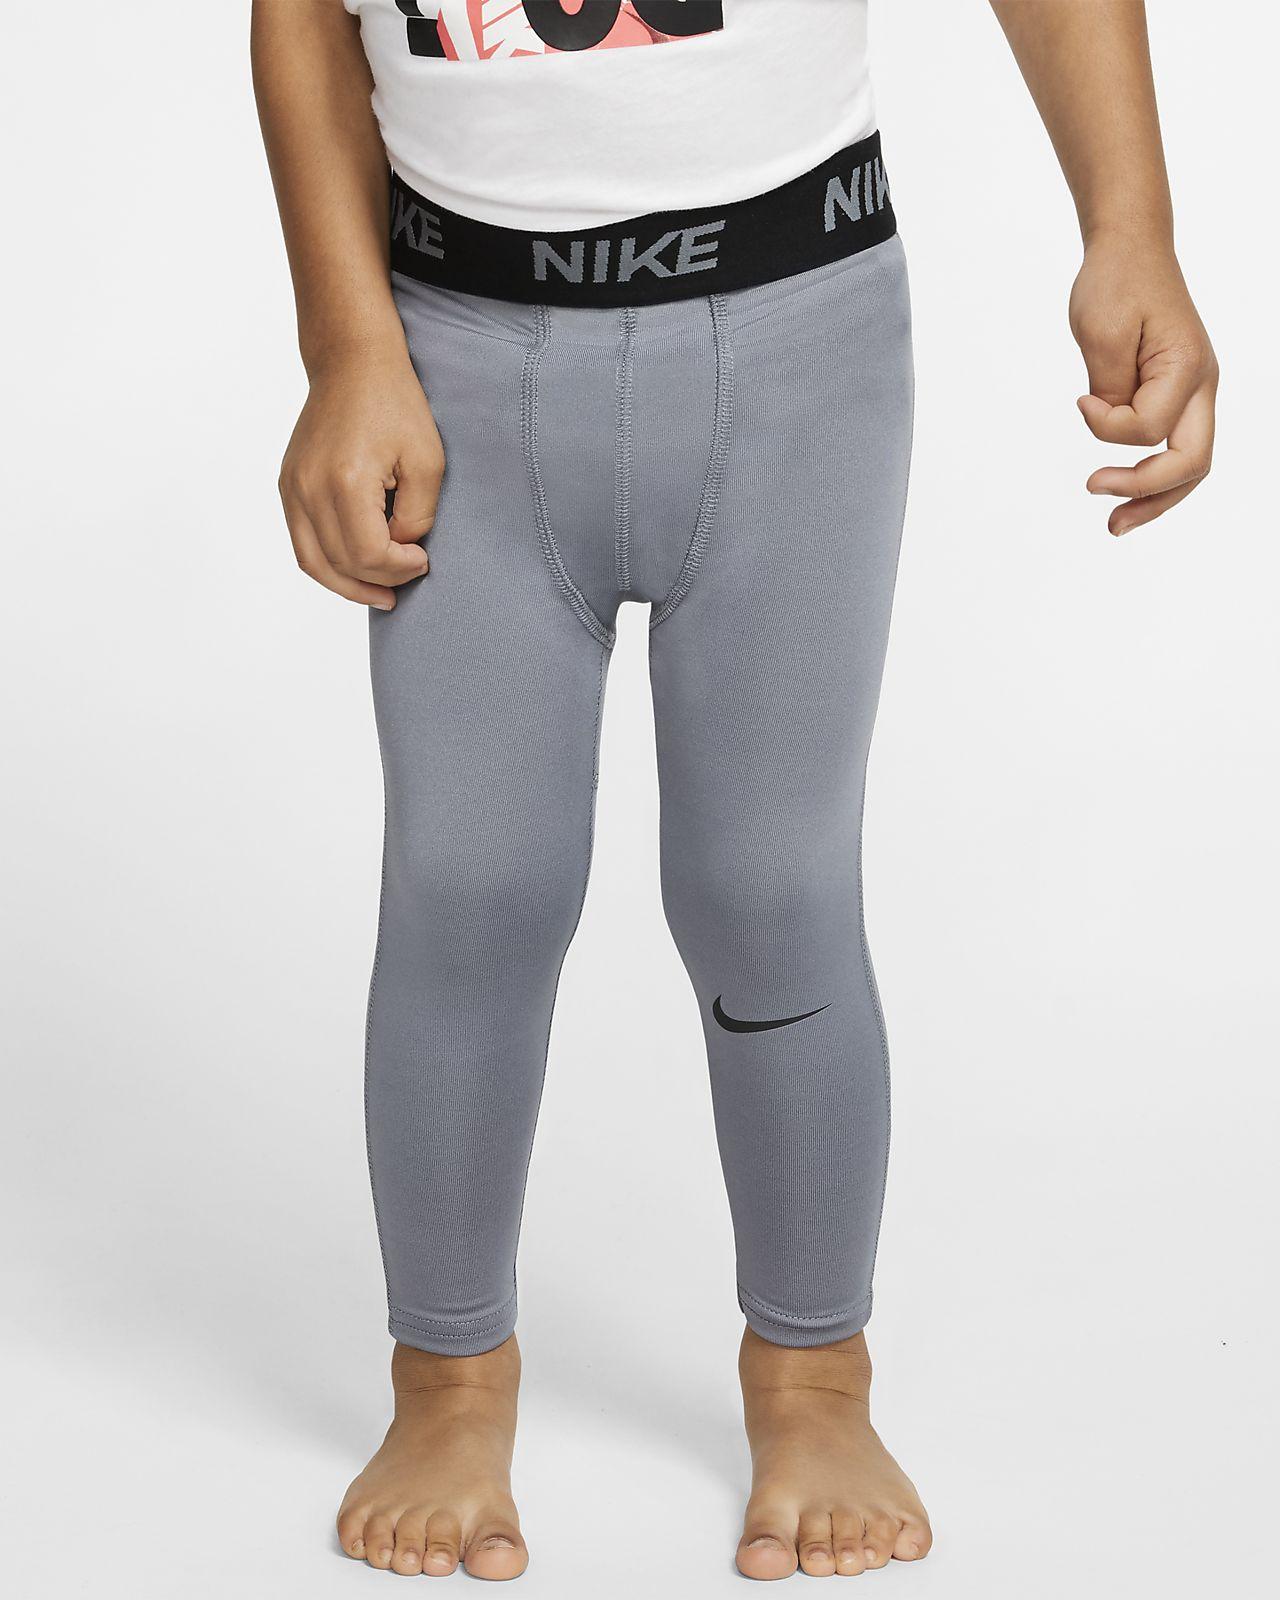 Nike Dri-FIT Toddler Tights